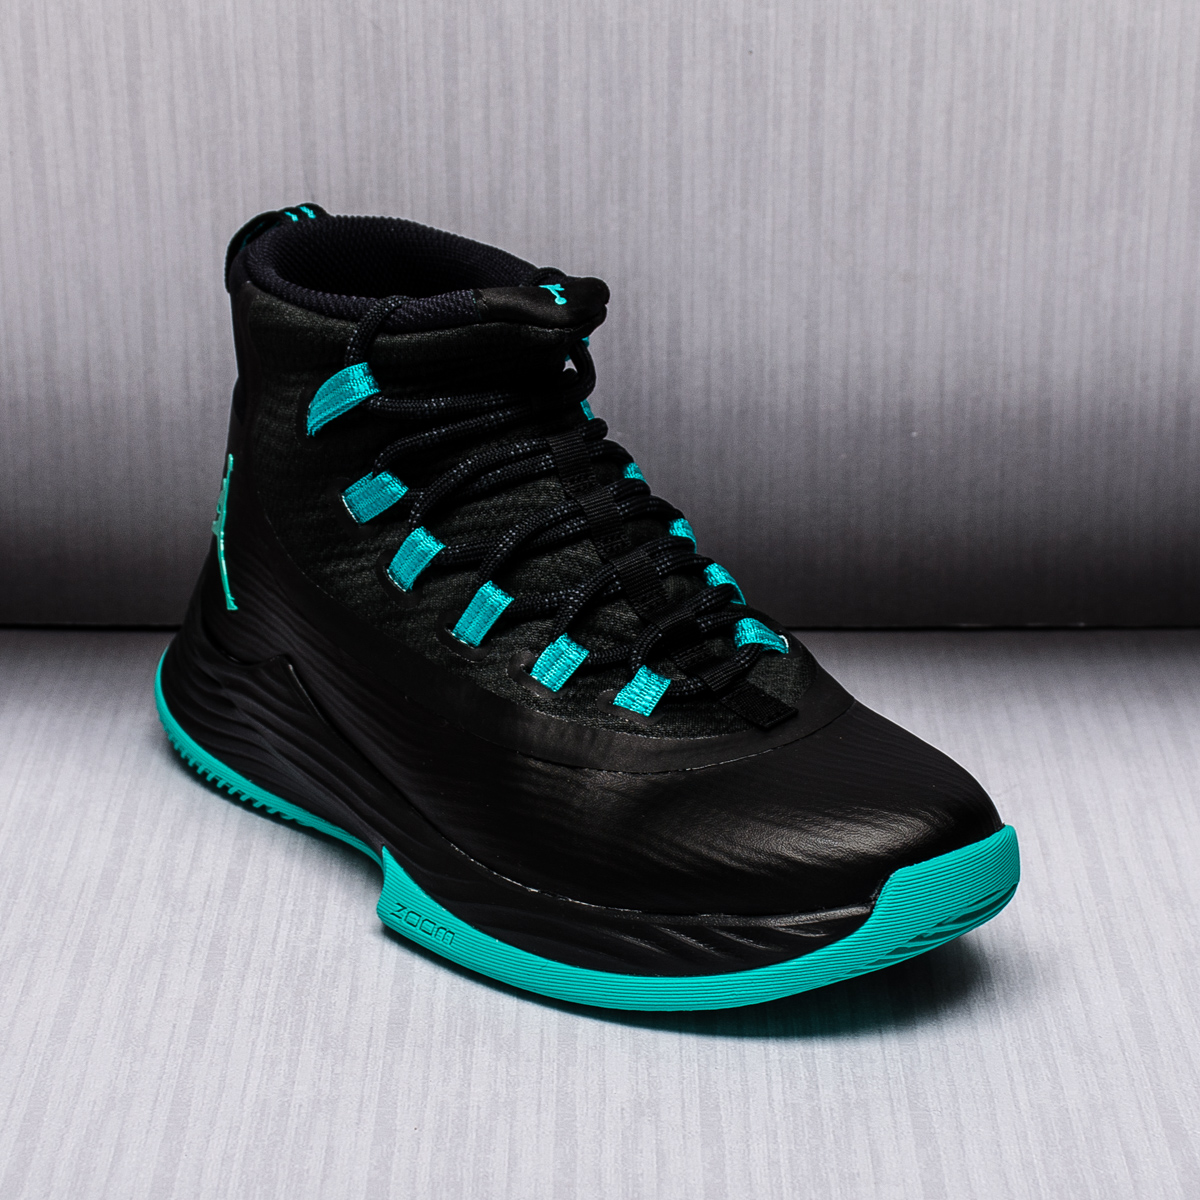 Jordan Fly 2 Po X Shoes Jade Black Shop At Ease